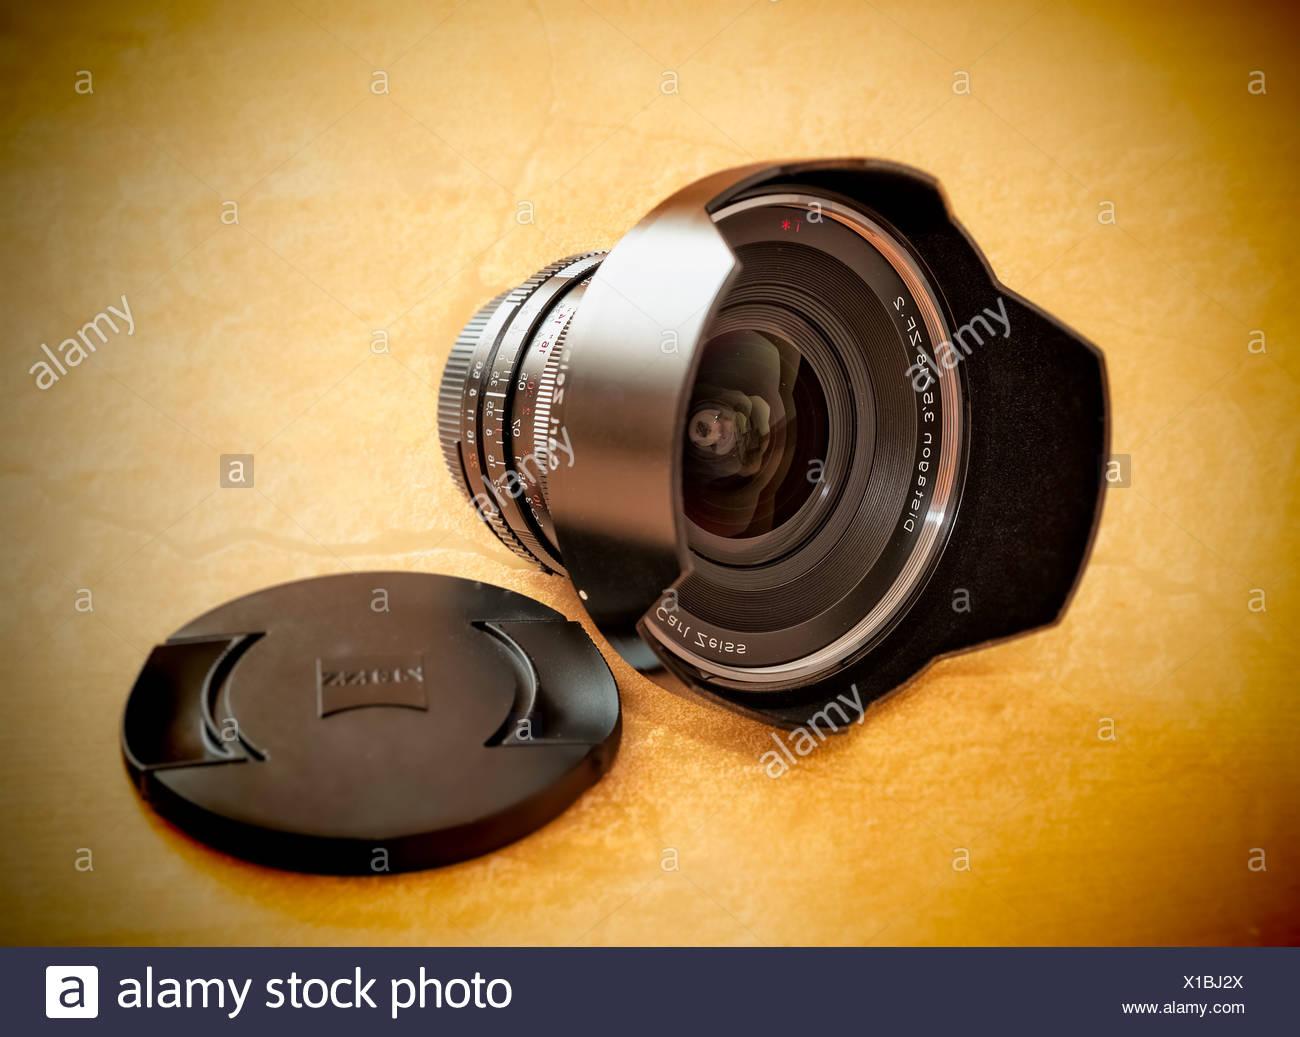 Weitwinkel-Objektiv, Zeiss Distagon ZN.2, 18mm, mit Deckel und Objektiv Kapuze Stockbild